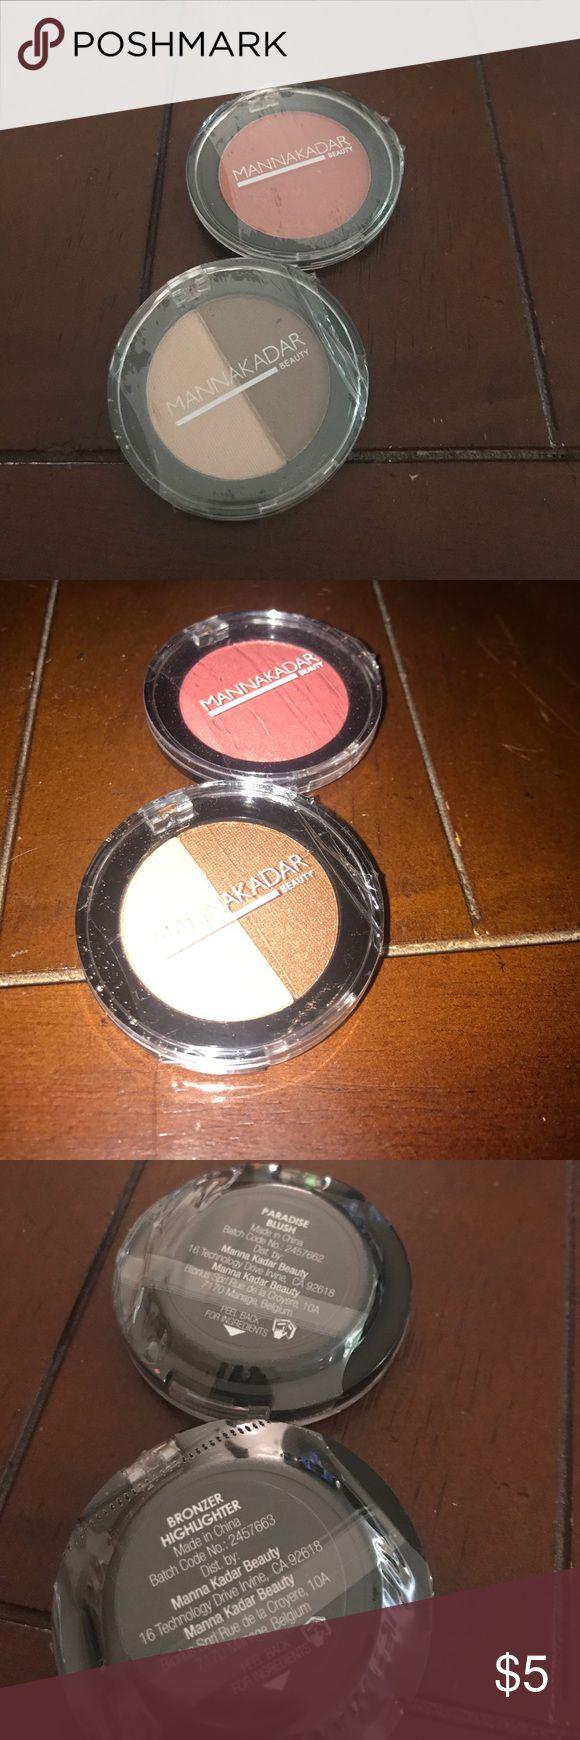 Blush or highlighter Brand new Mannakadar Makeup Blush